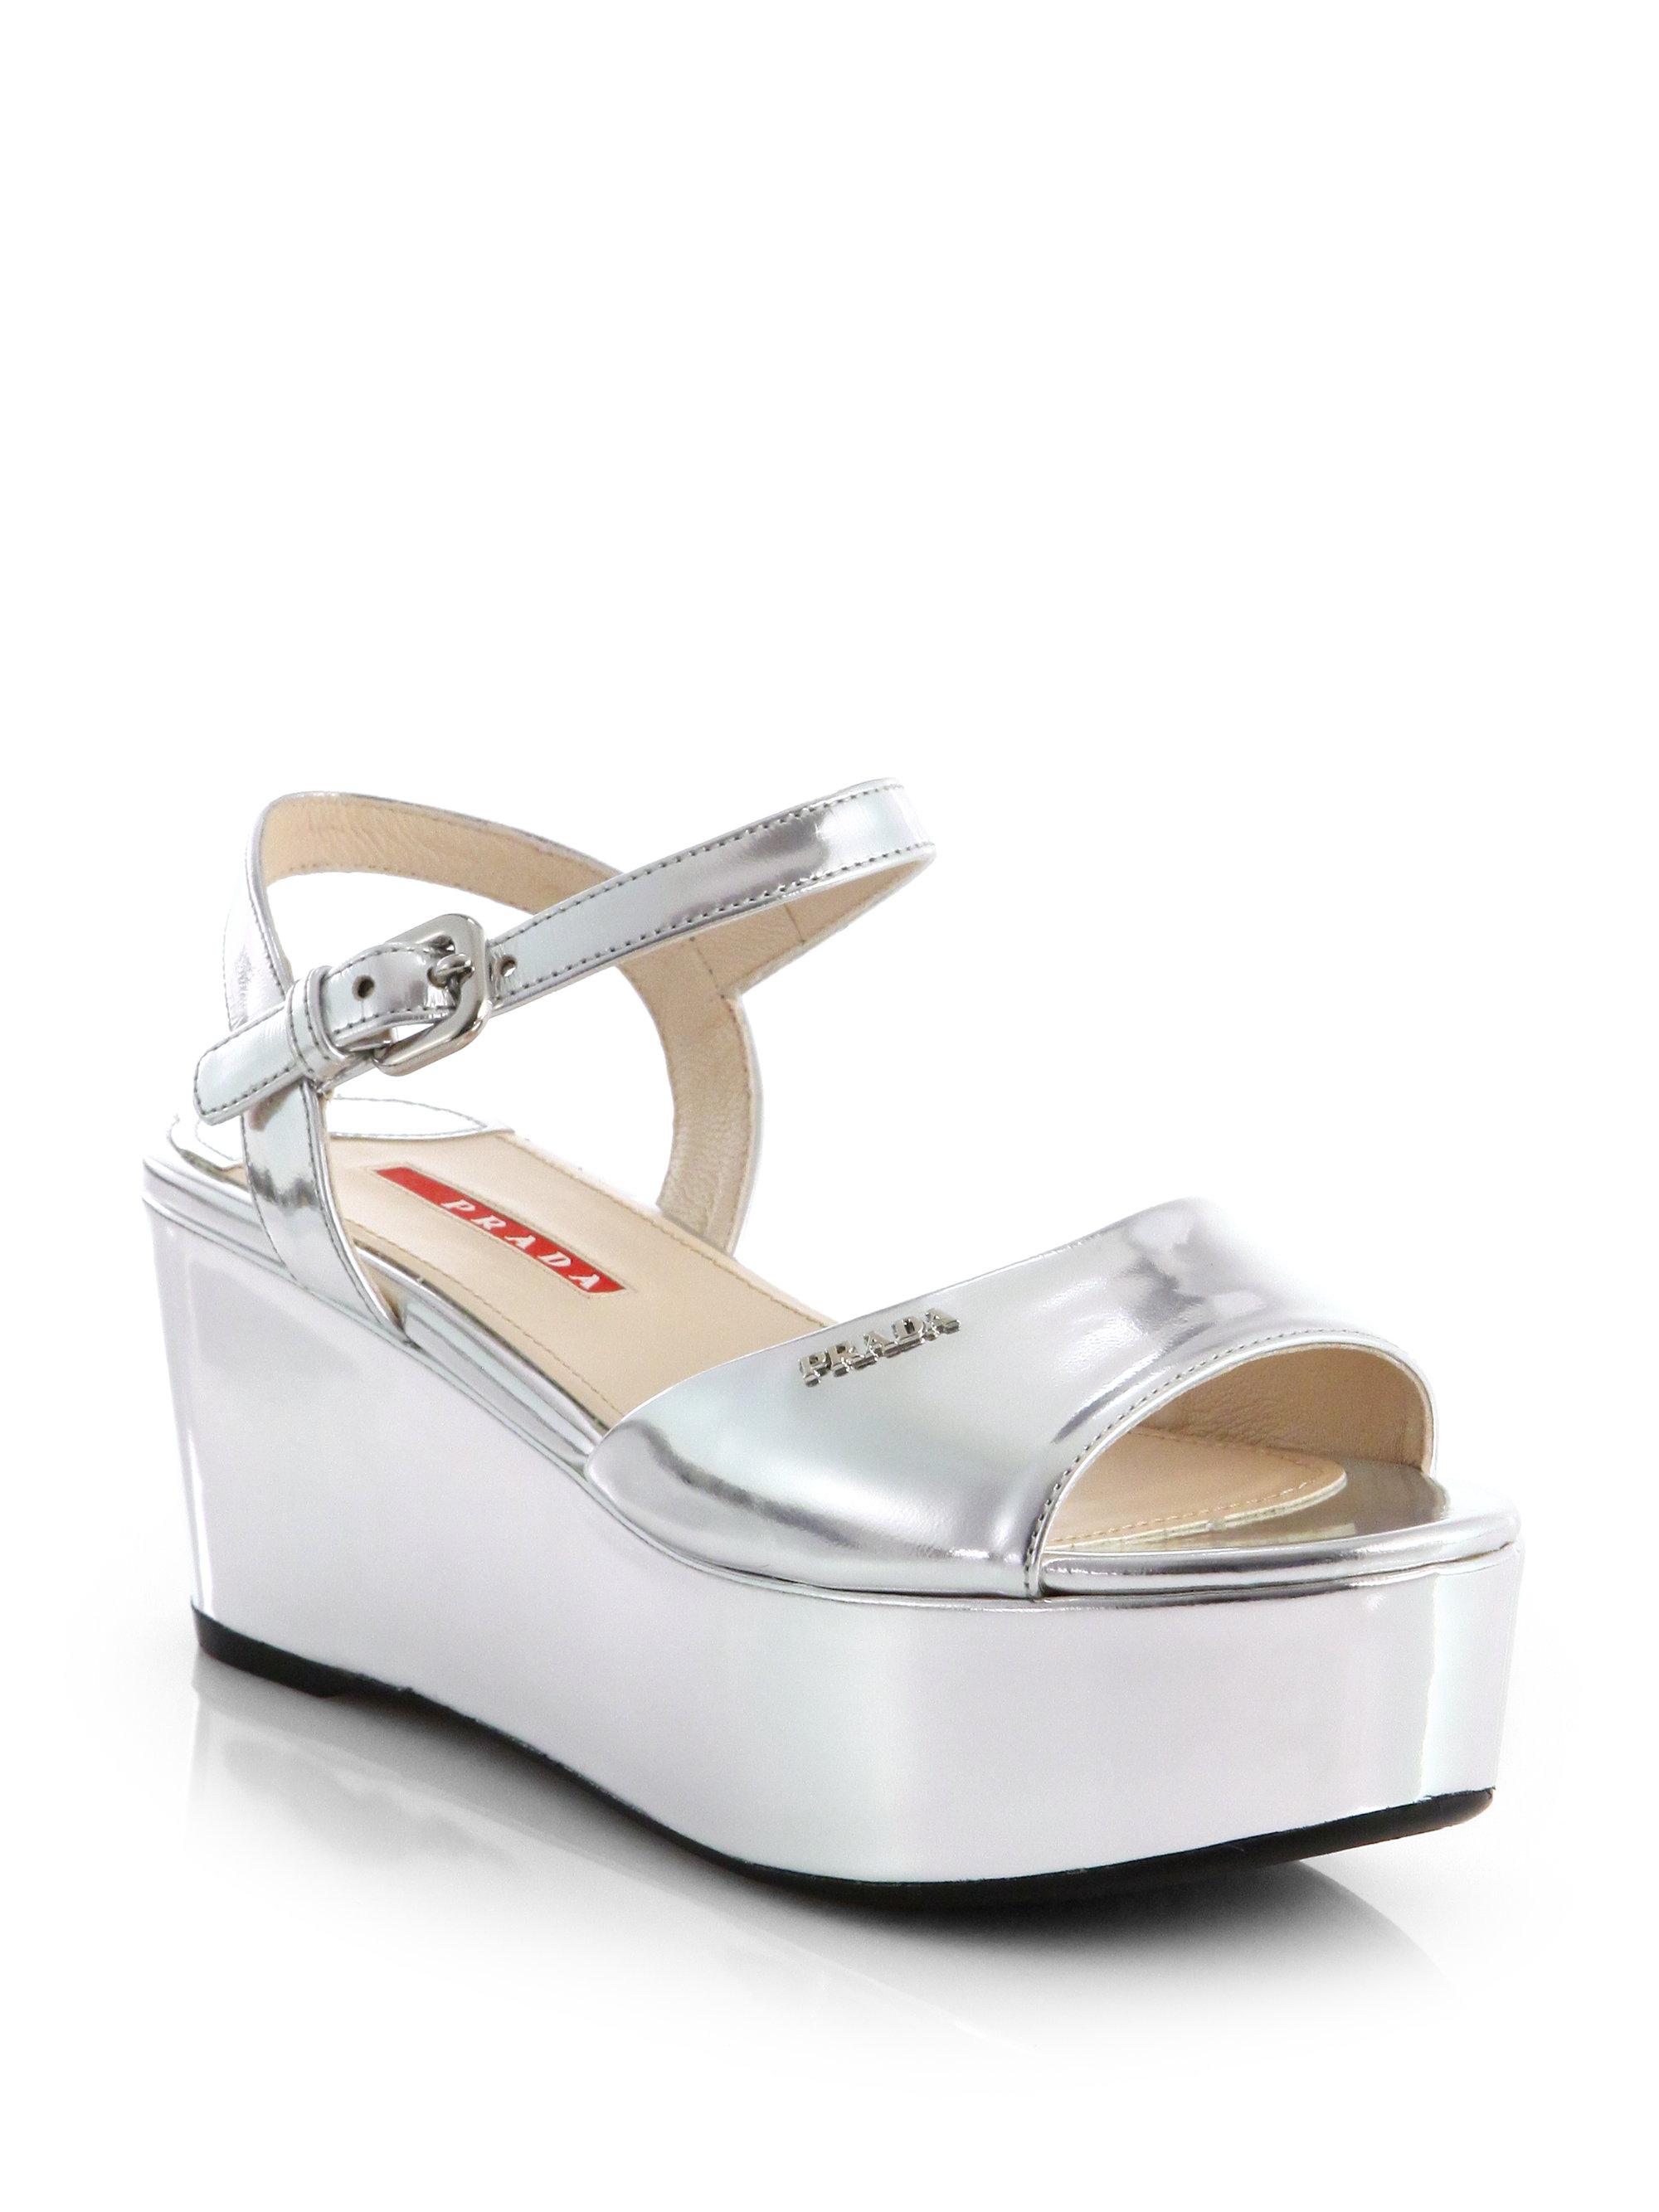 0881da796e75 Lyst - Prada Metallic Leather Platform Wedge Sandals in Metallic